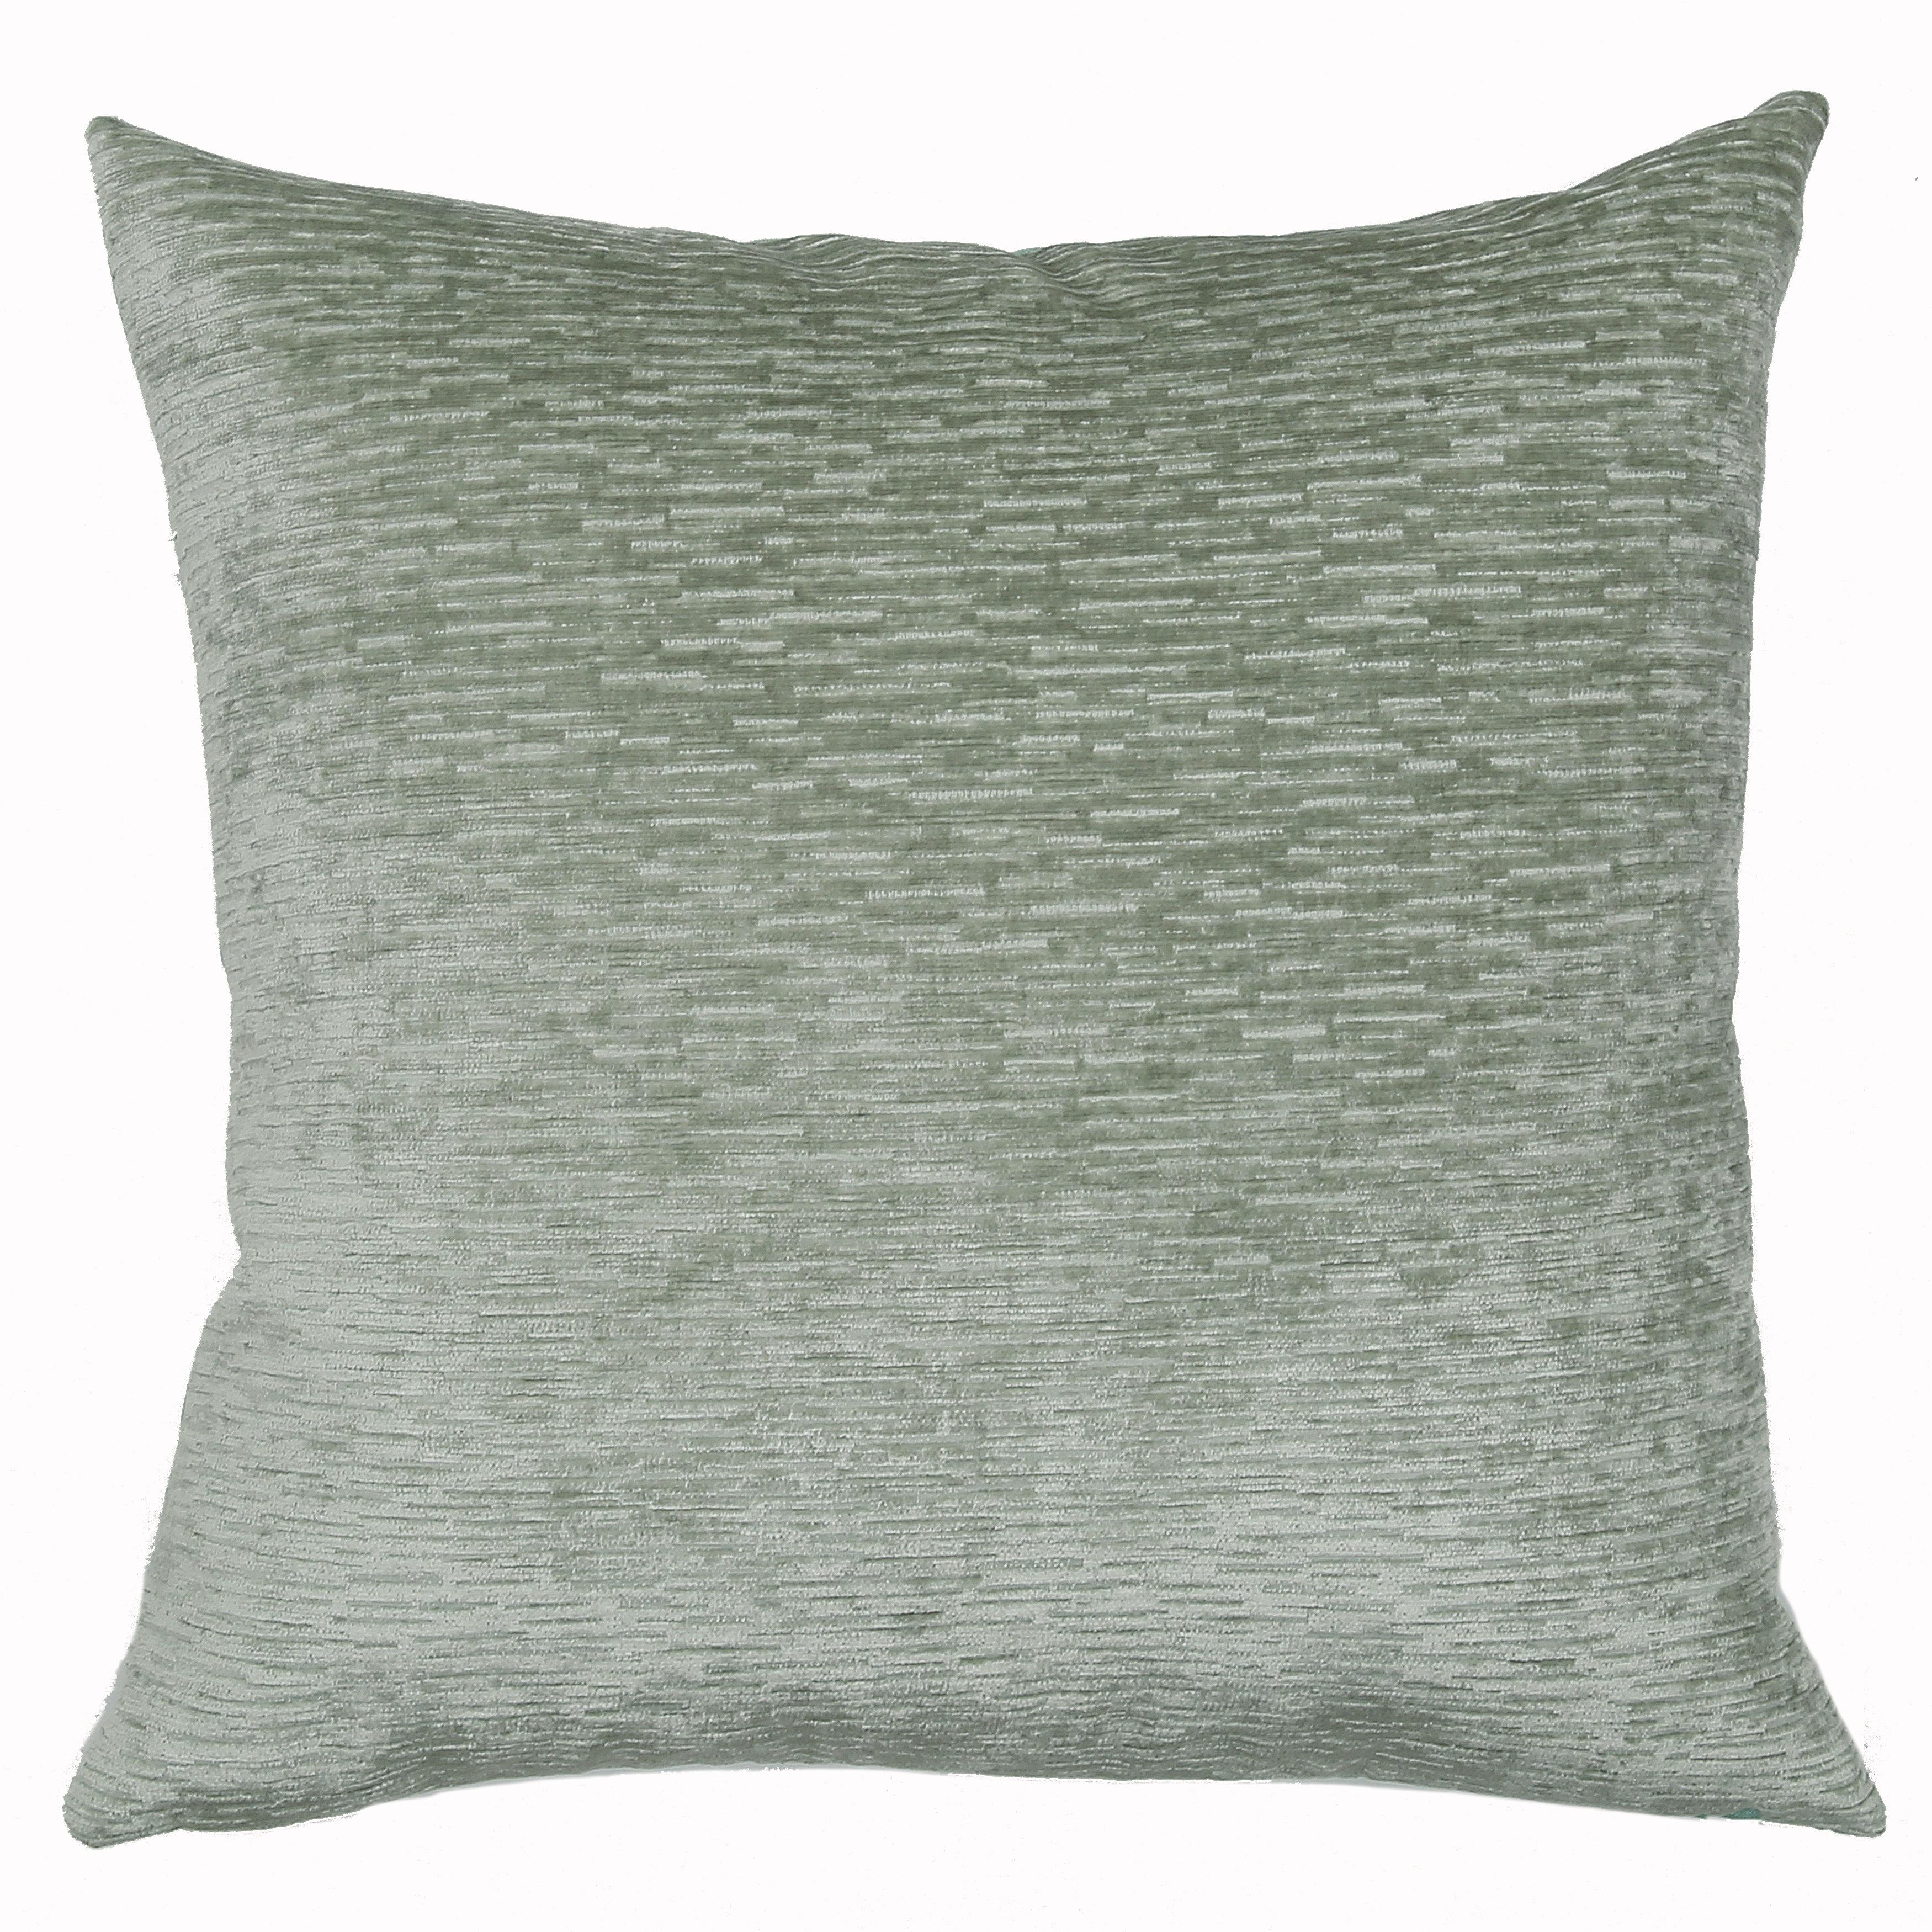 Toss By Daniel Stuart Studio Canterbury Feathers Abstract Throw Pillow Wayfair